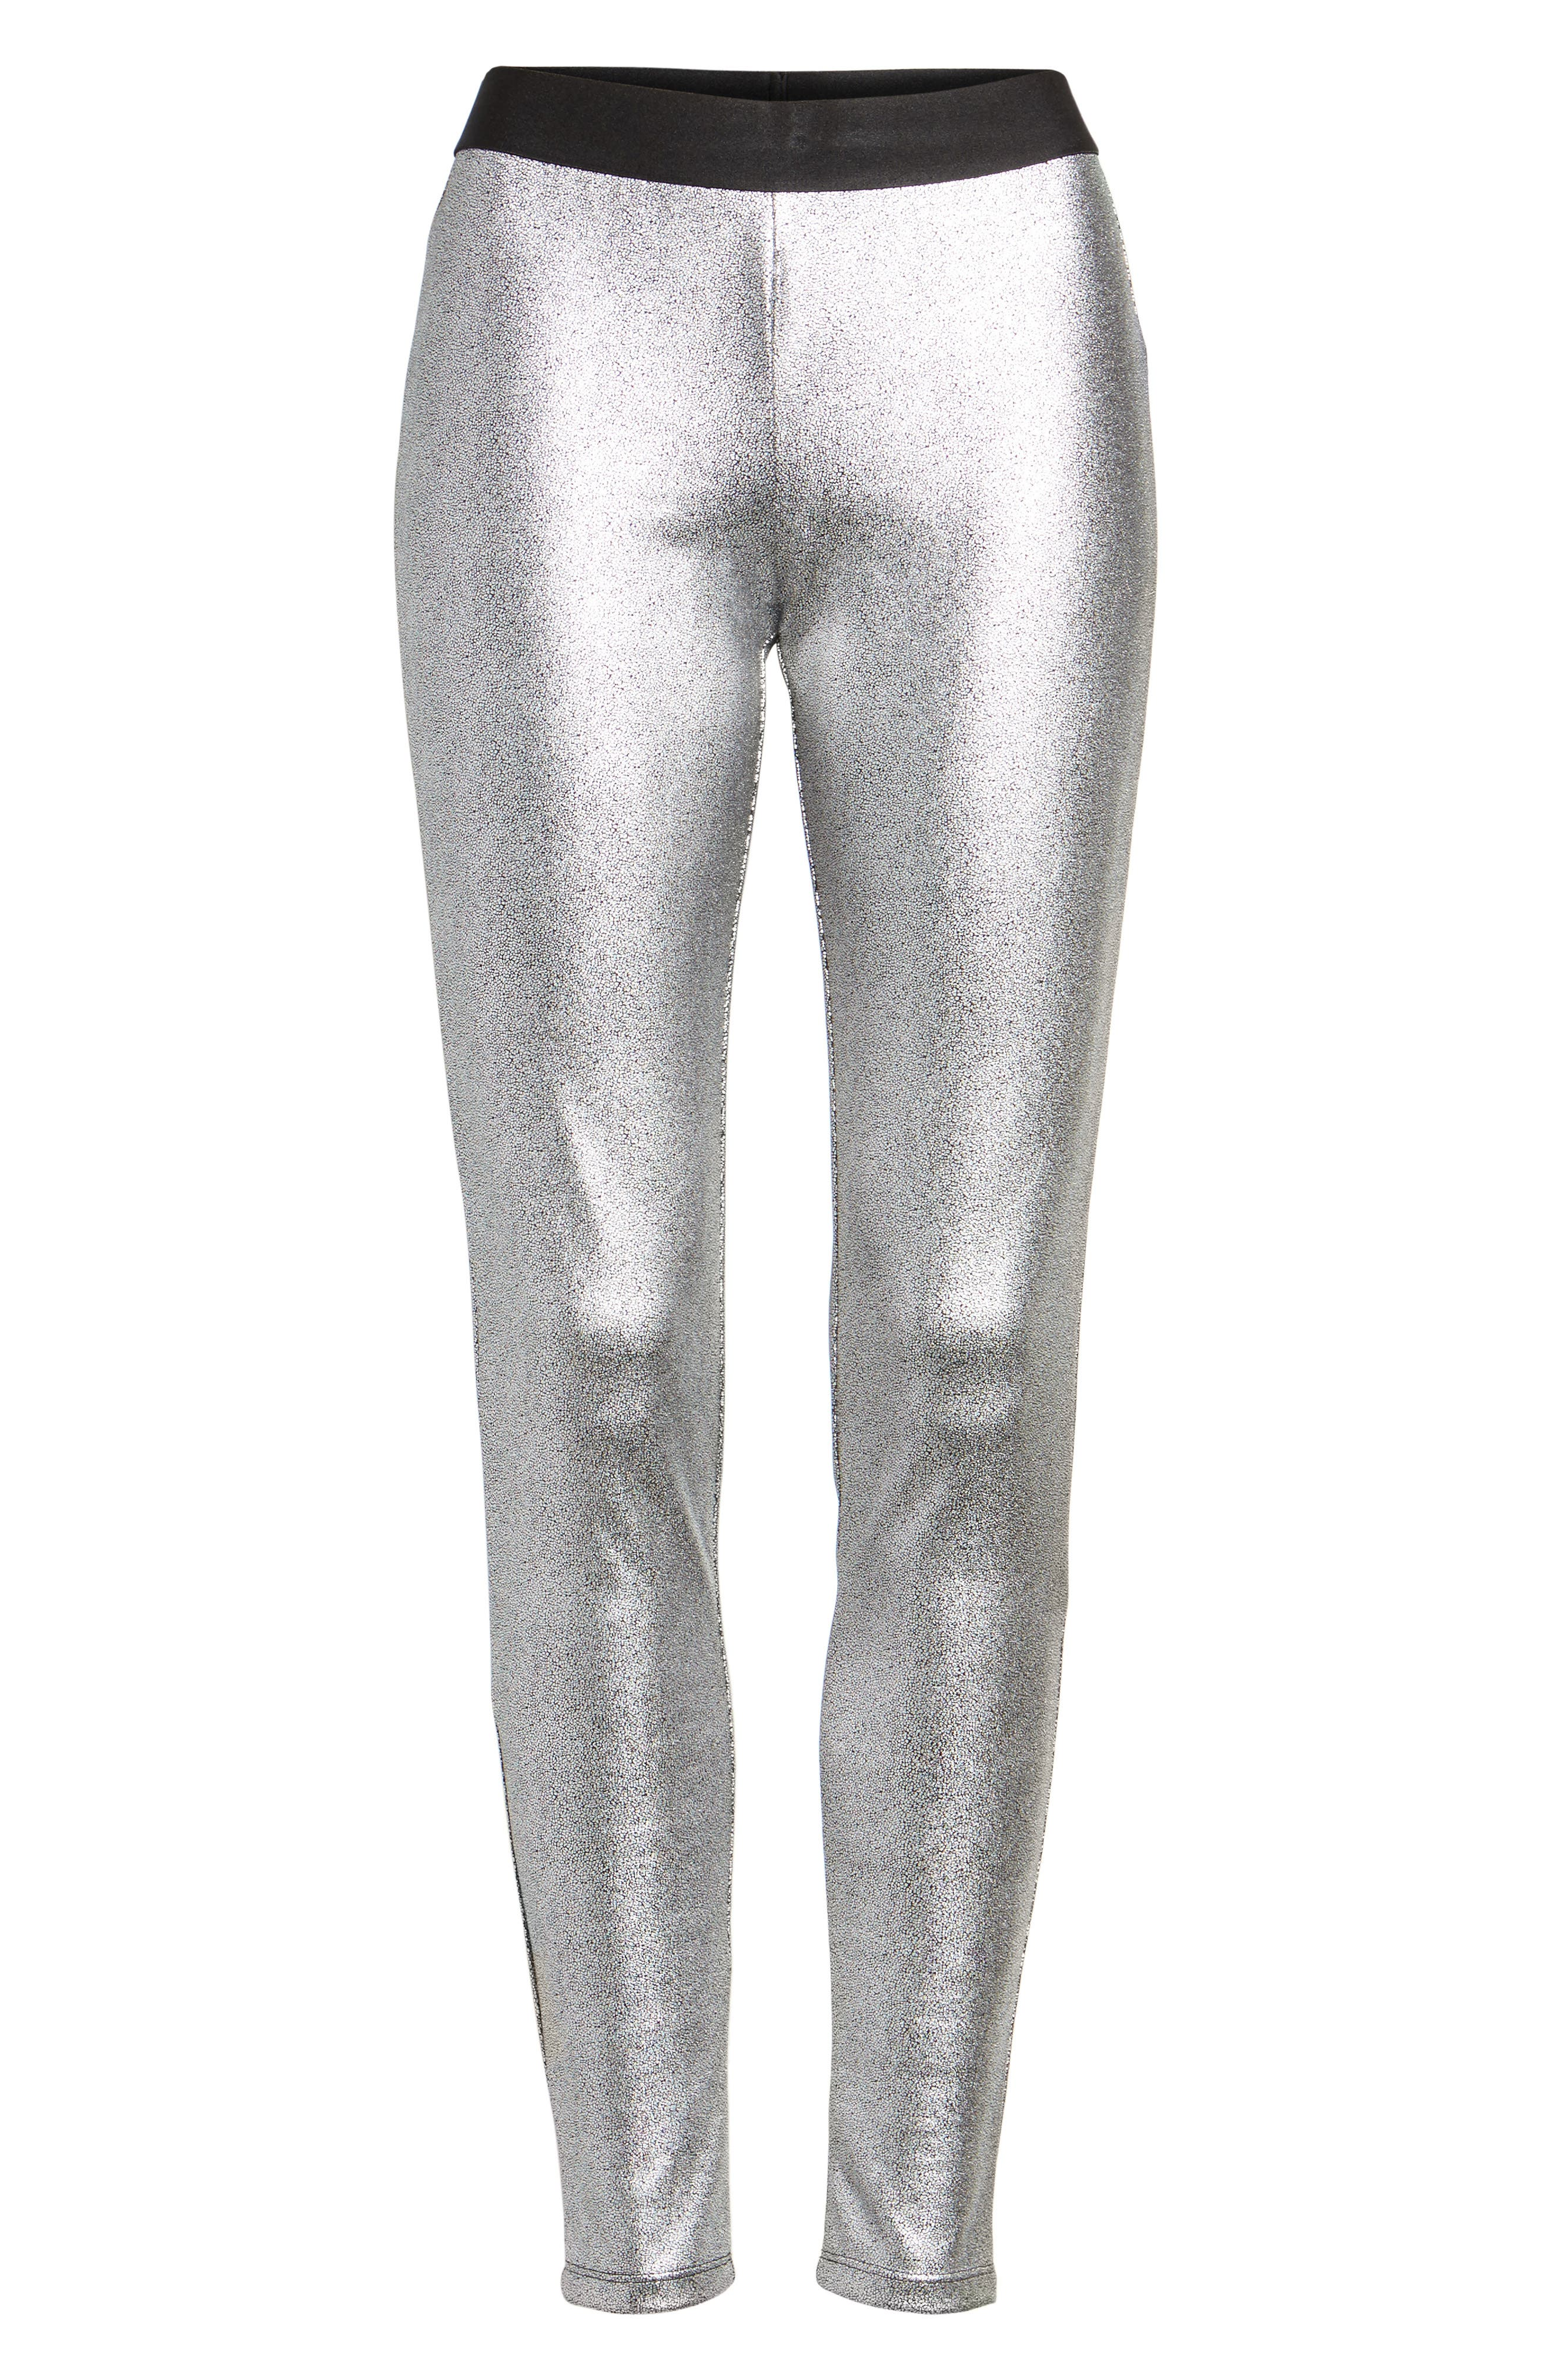 Metallic Leggings,                             Alternate thumbnail 4, color,                             Silver